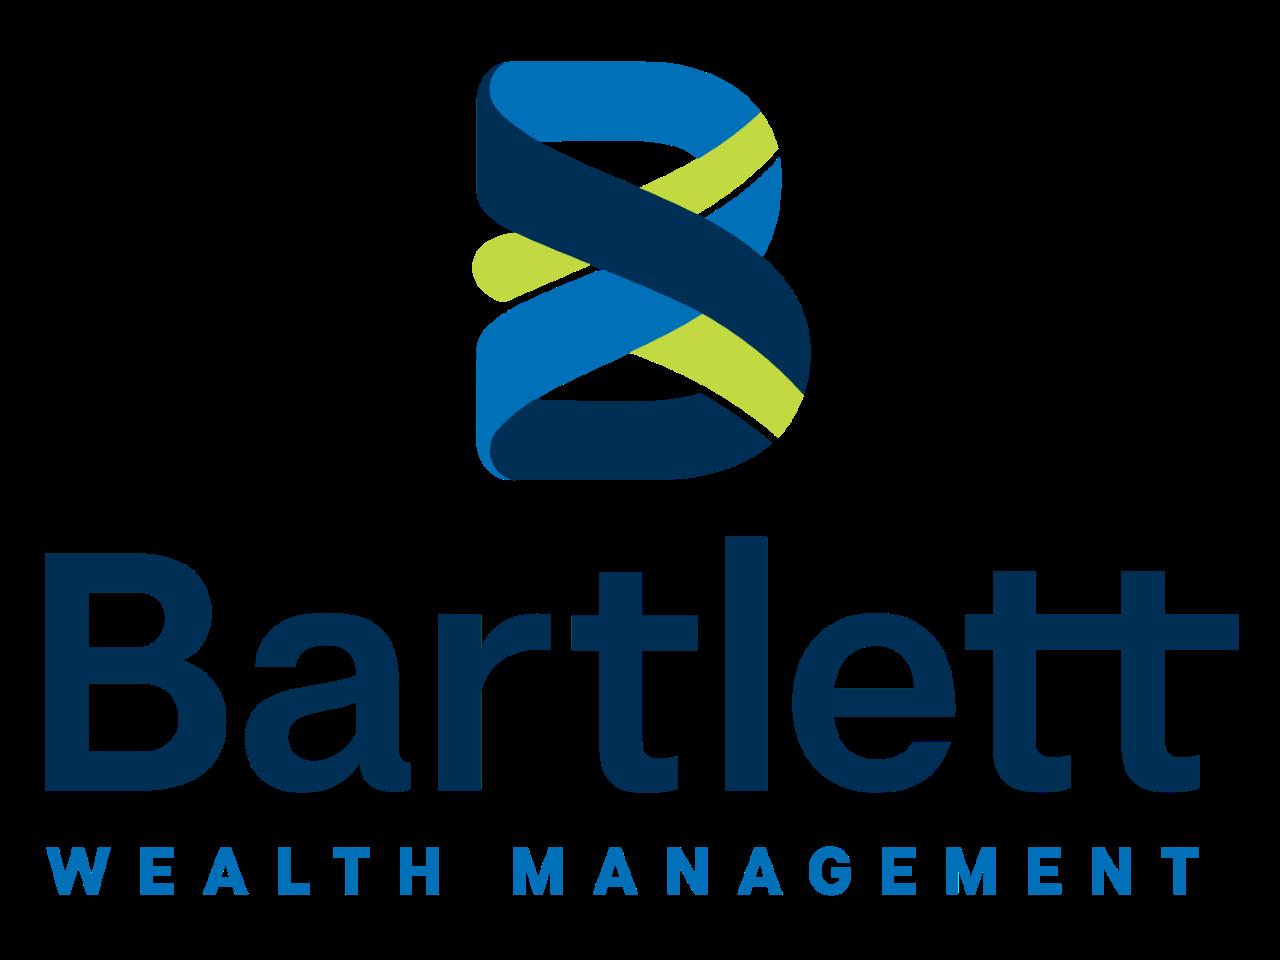 Bartlett Wealth Management Company Logo